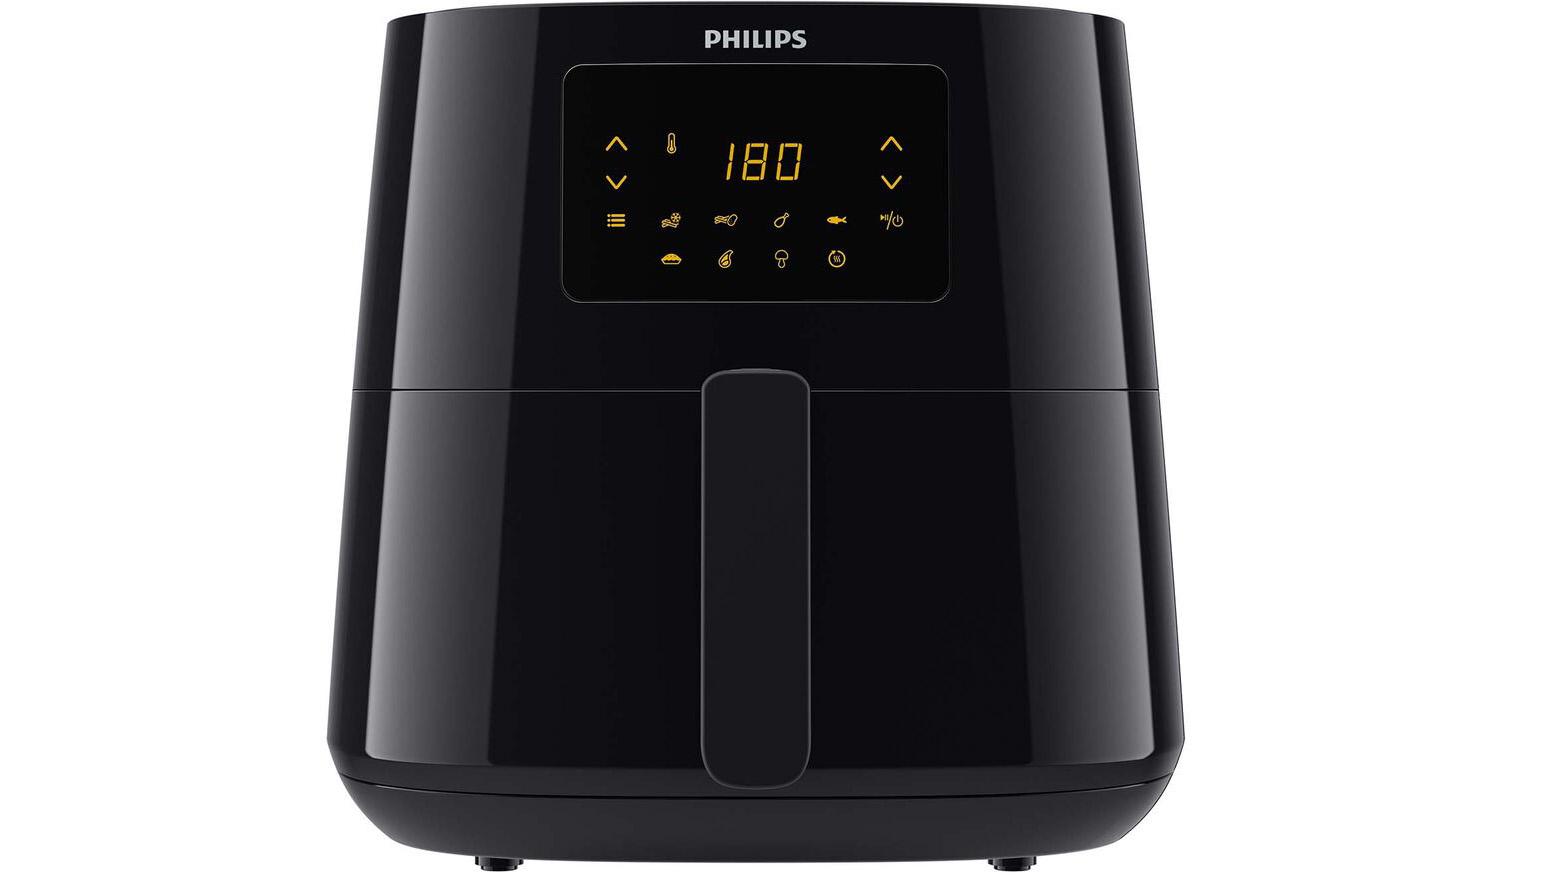 Philips Essential Air Fryer XL